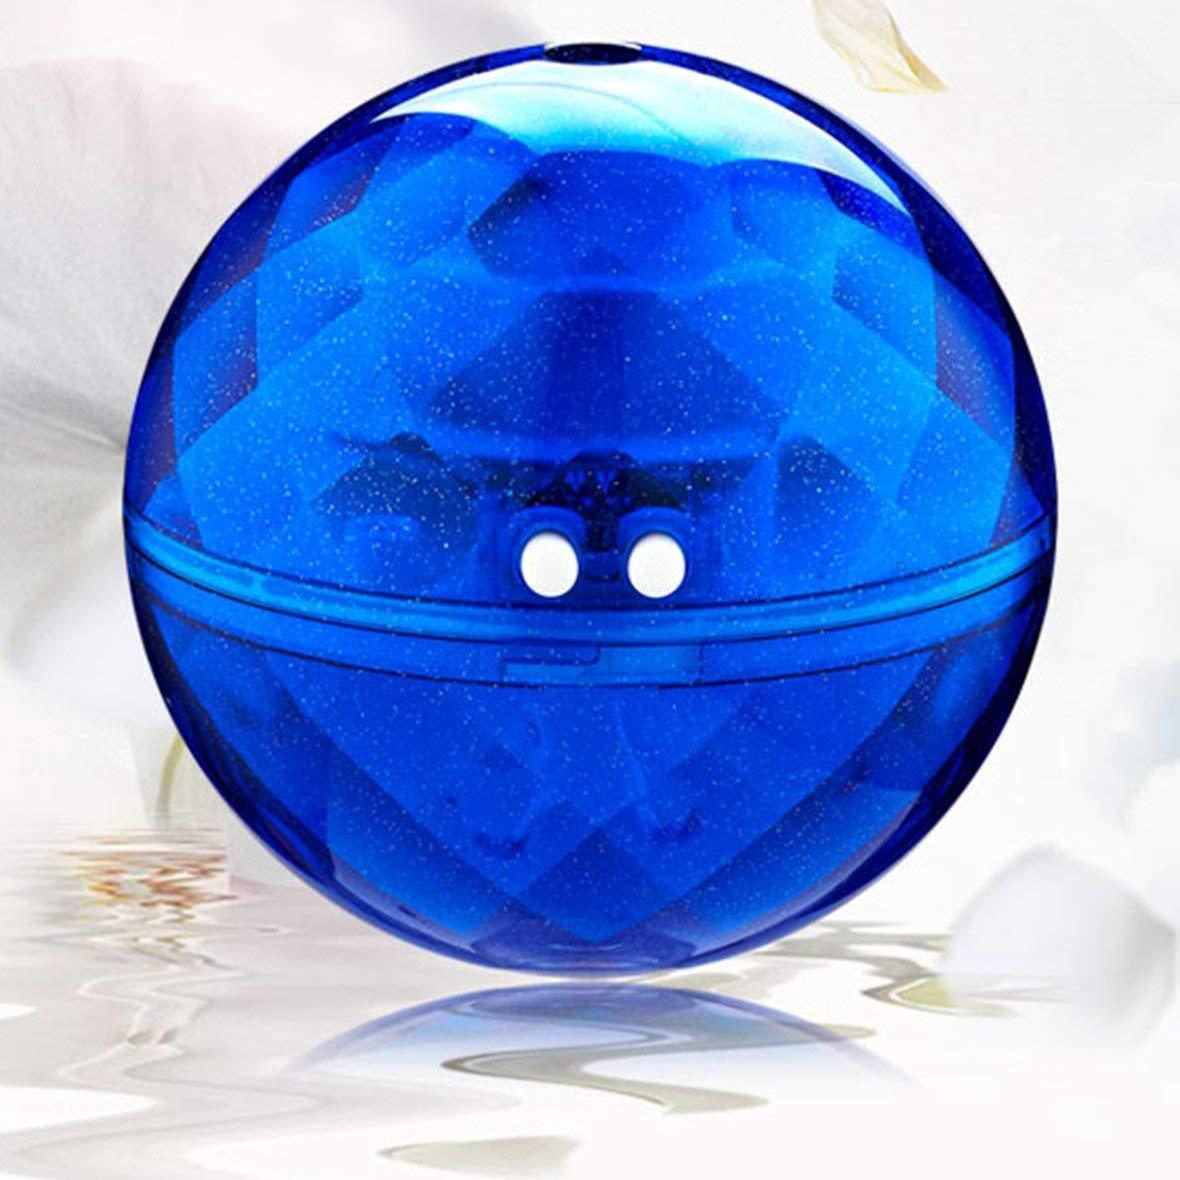 Tivolii Portable Mini Handy Air Aroma Essential Oil Diffuser Professional LED Ultrasonic Humidifier Aromatherapy Purifier